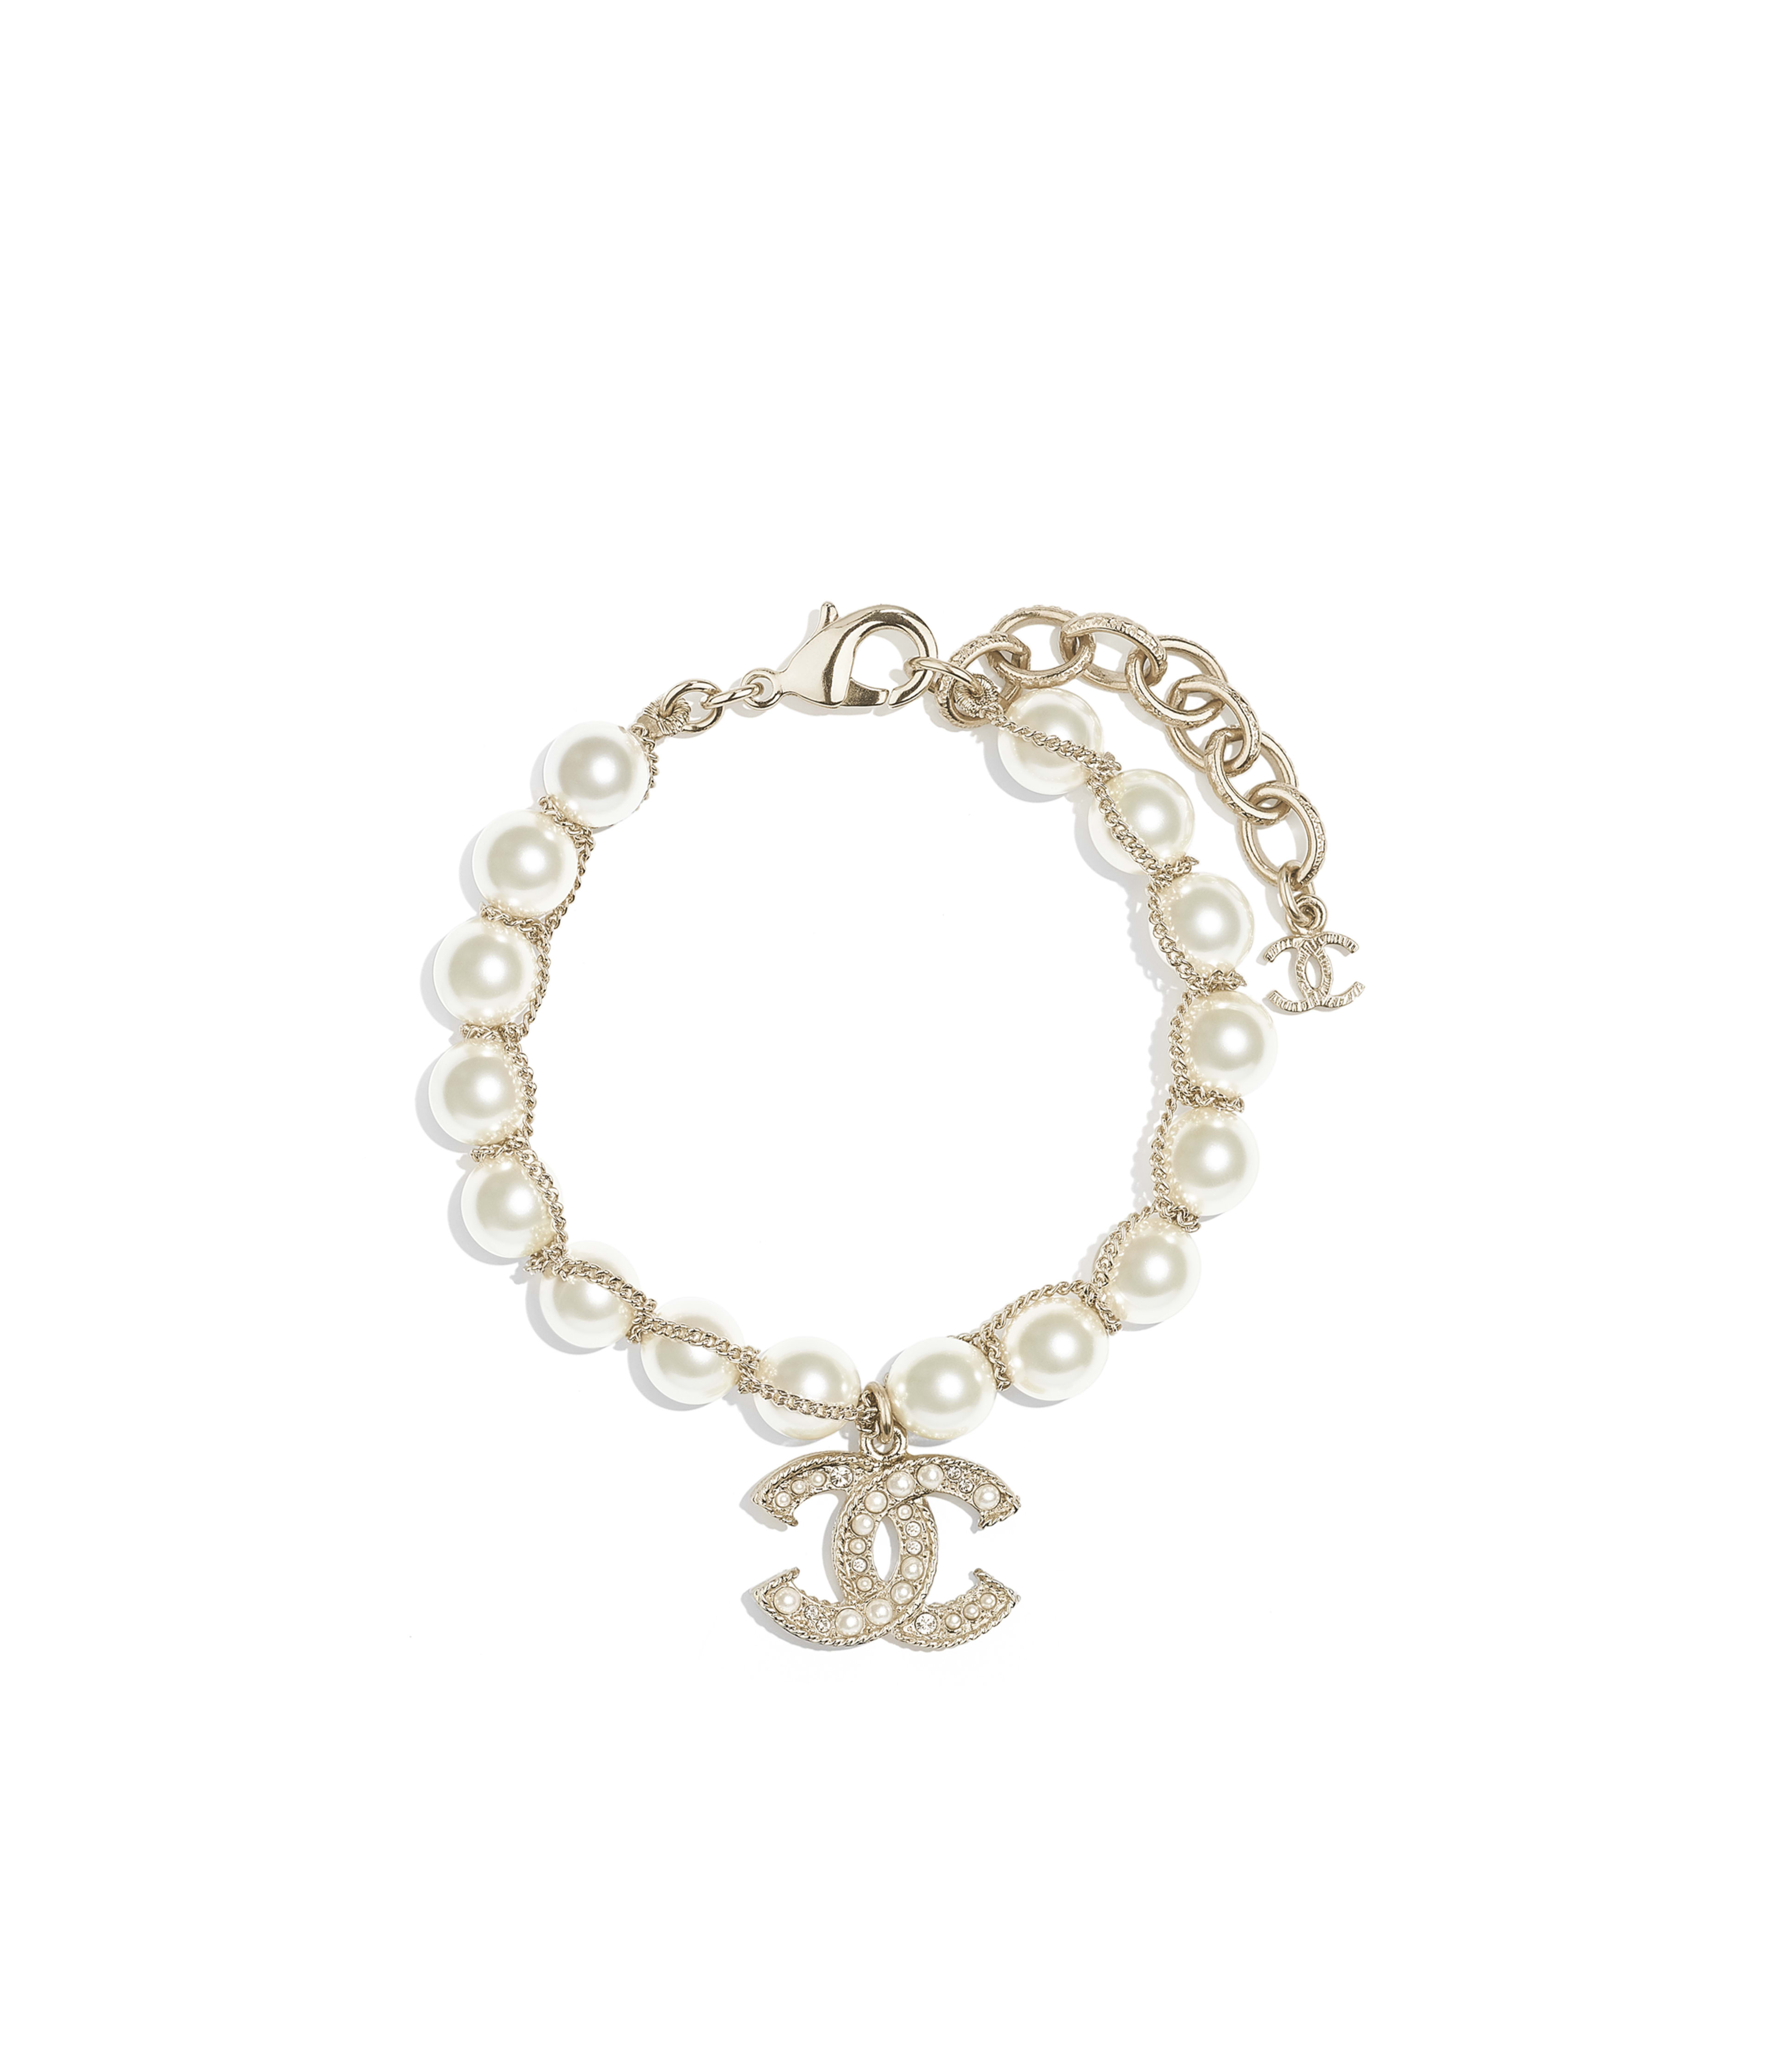 718e4779abac Bracelets   Cuffs - Costume jewelry